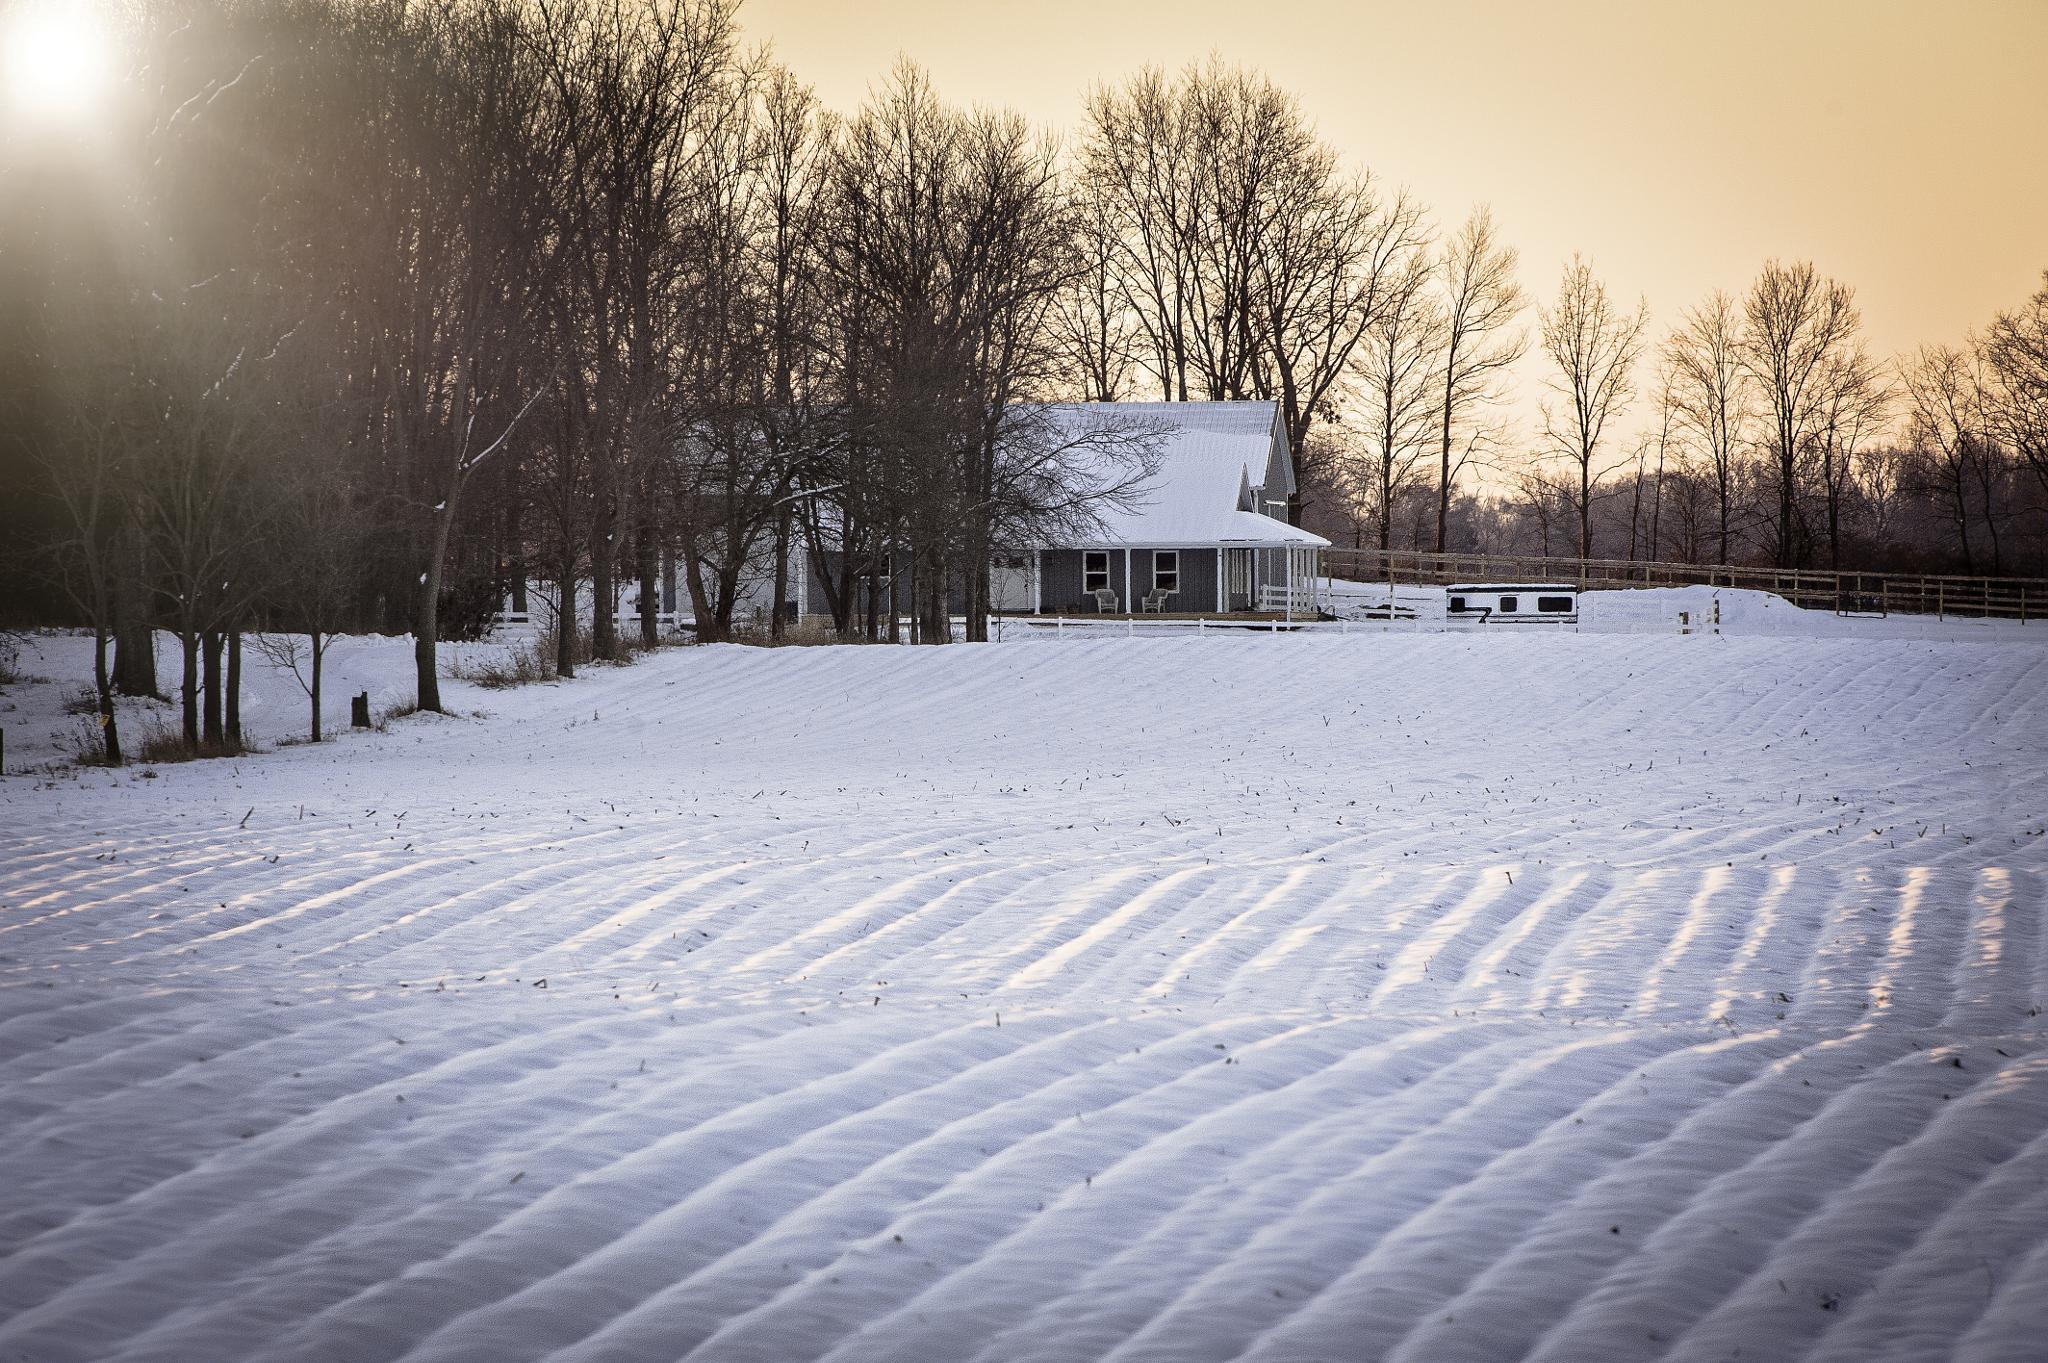 Winter Sunrise by TerryLynn